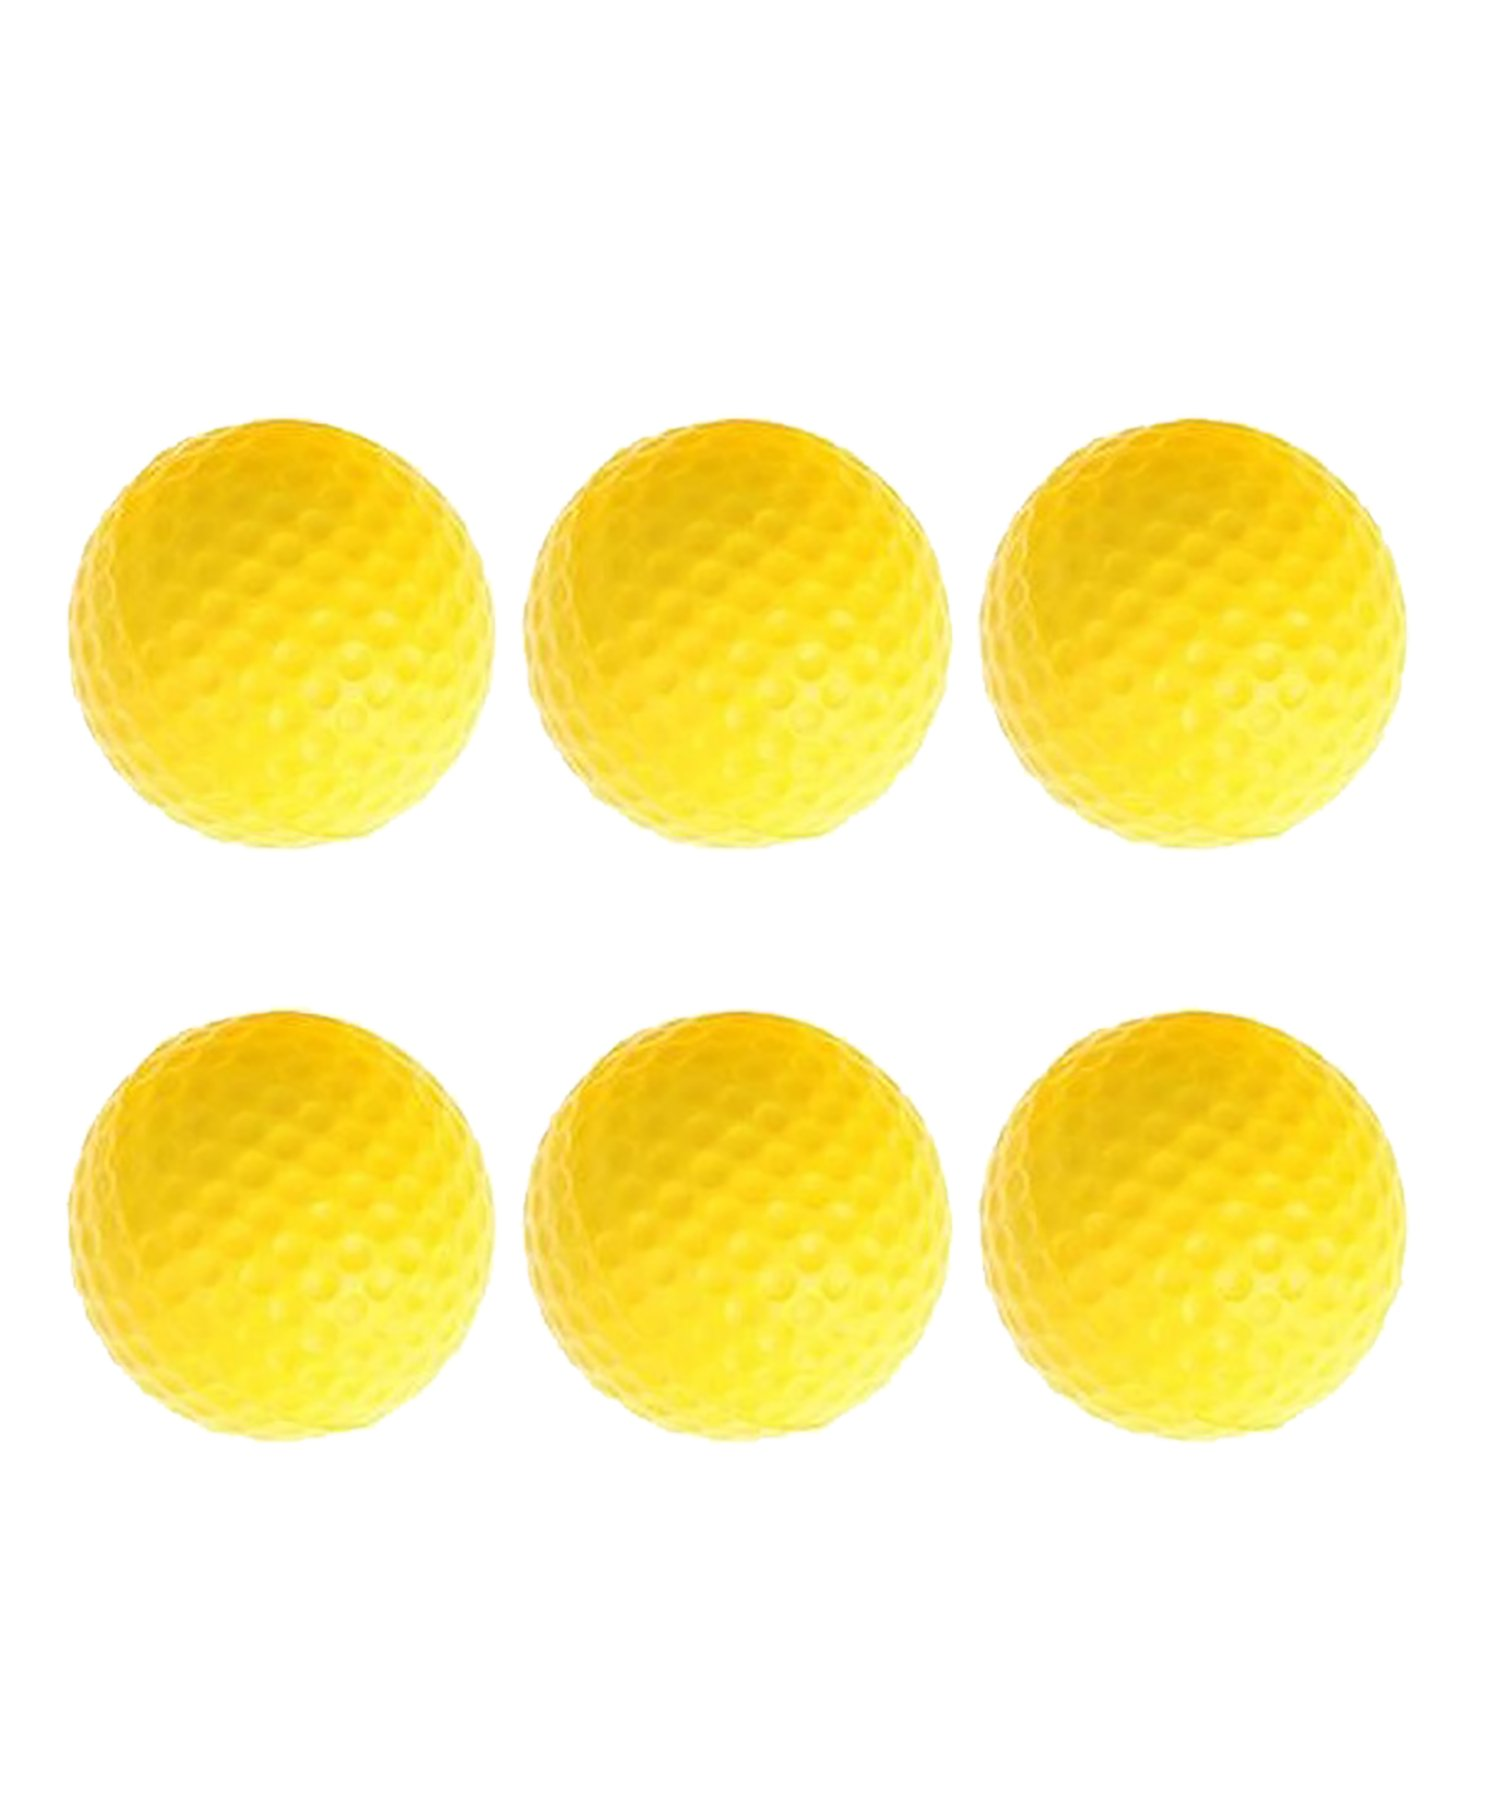 POSMA HM020A 30x60cm Golf Practice Double Side Hit Mat bundle Gift set with 3pcs Rubber Tee + 2pcs Tour Balls + 6pcs Golf Balls + 1pc Portable Golf Chipping Hitting Net for indoor by POSMA (Image #5)